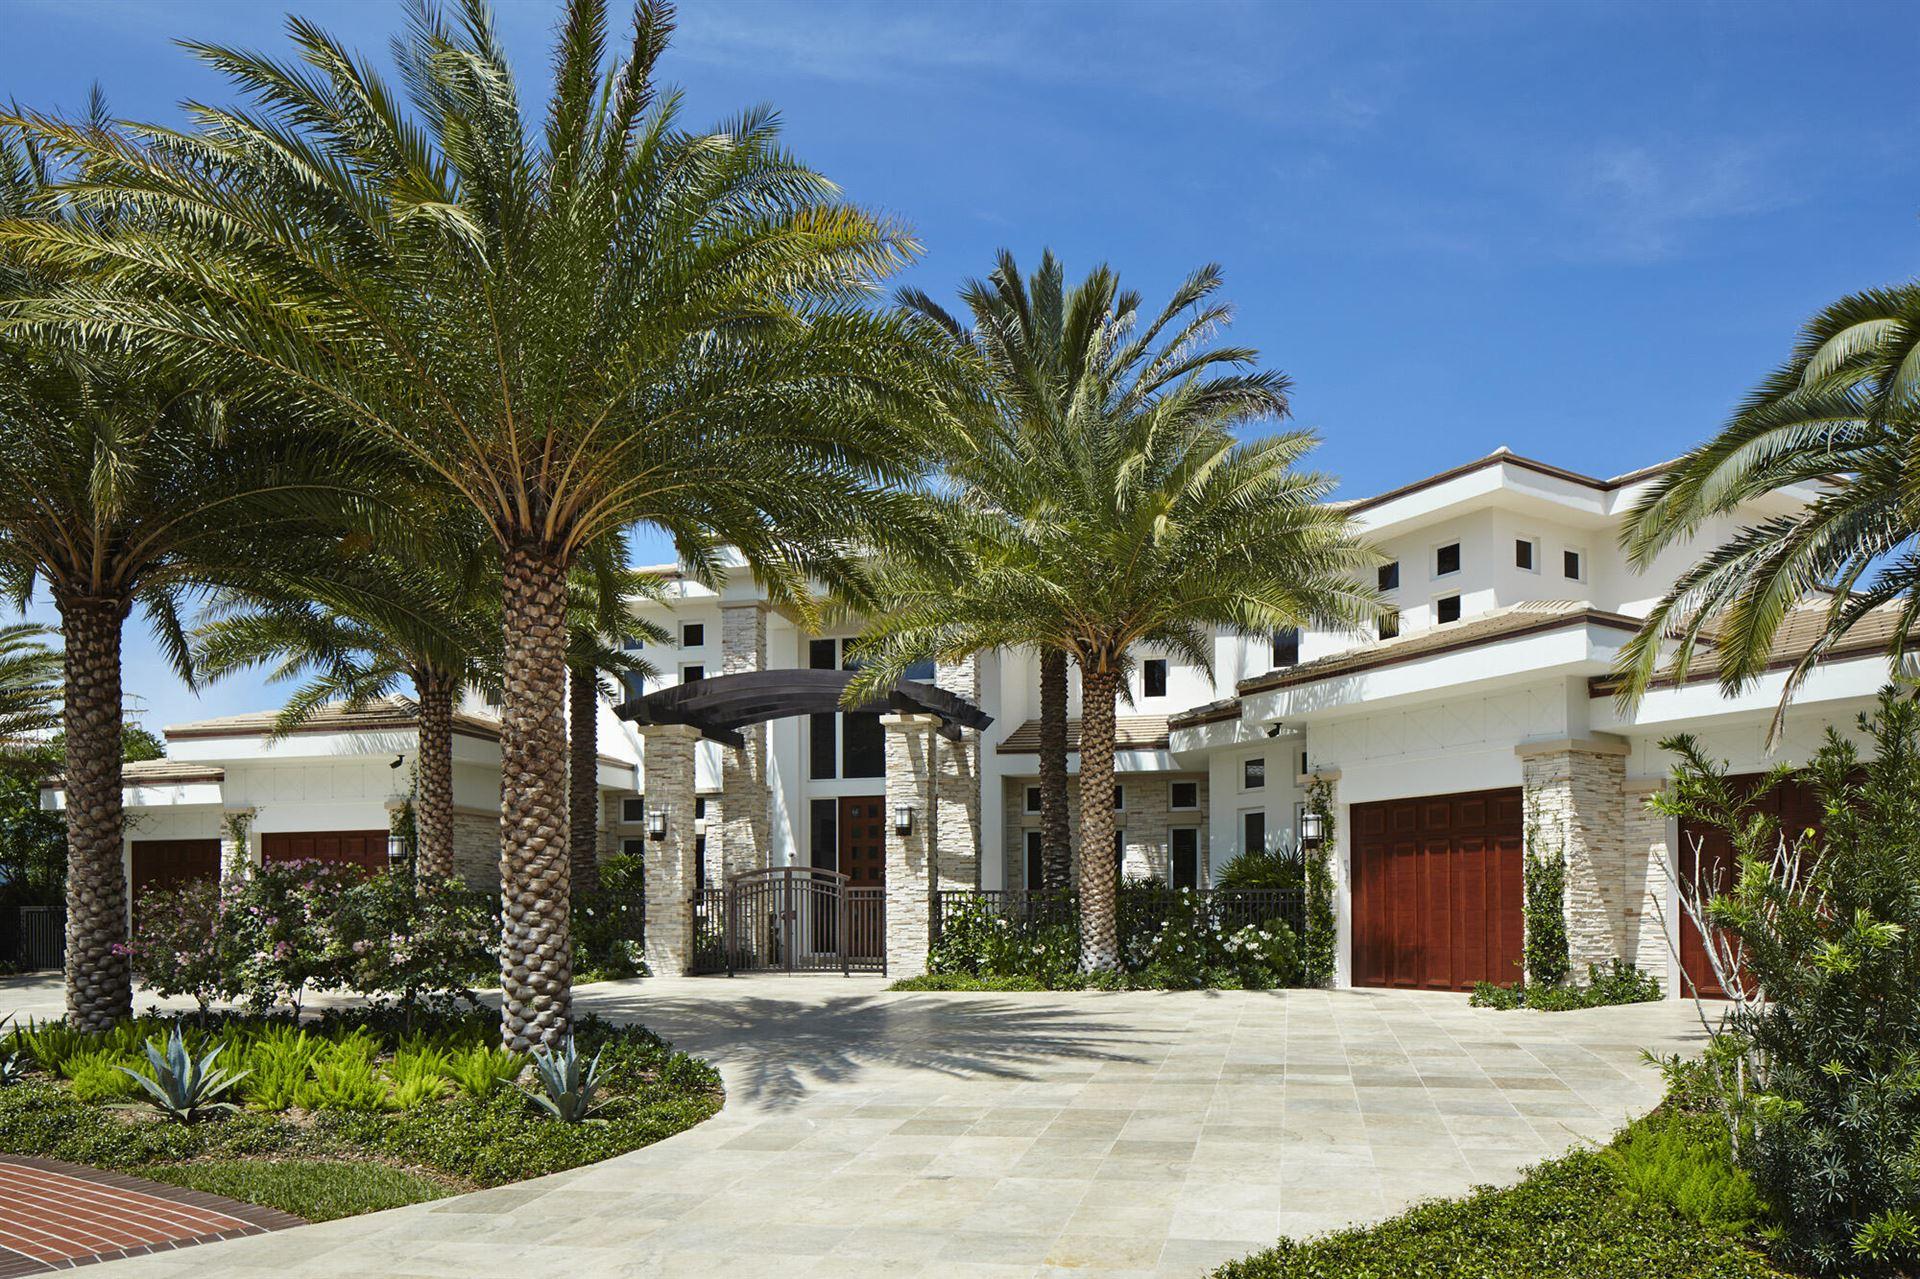 Boca Raton,FL- $11,495,000